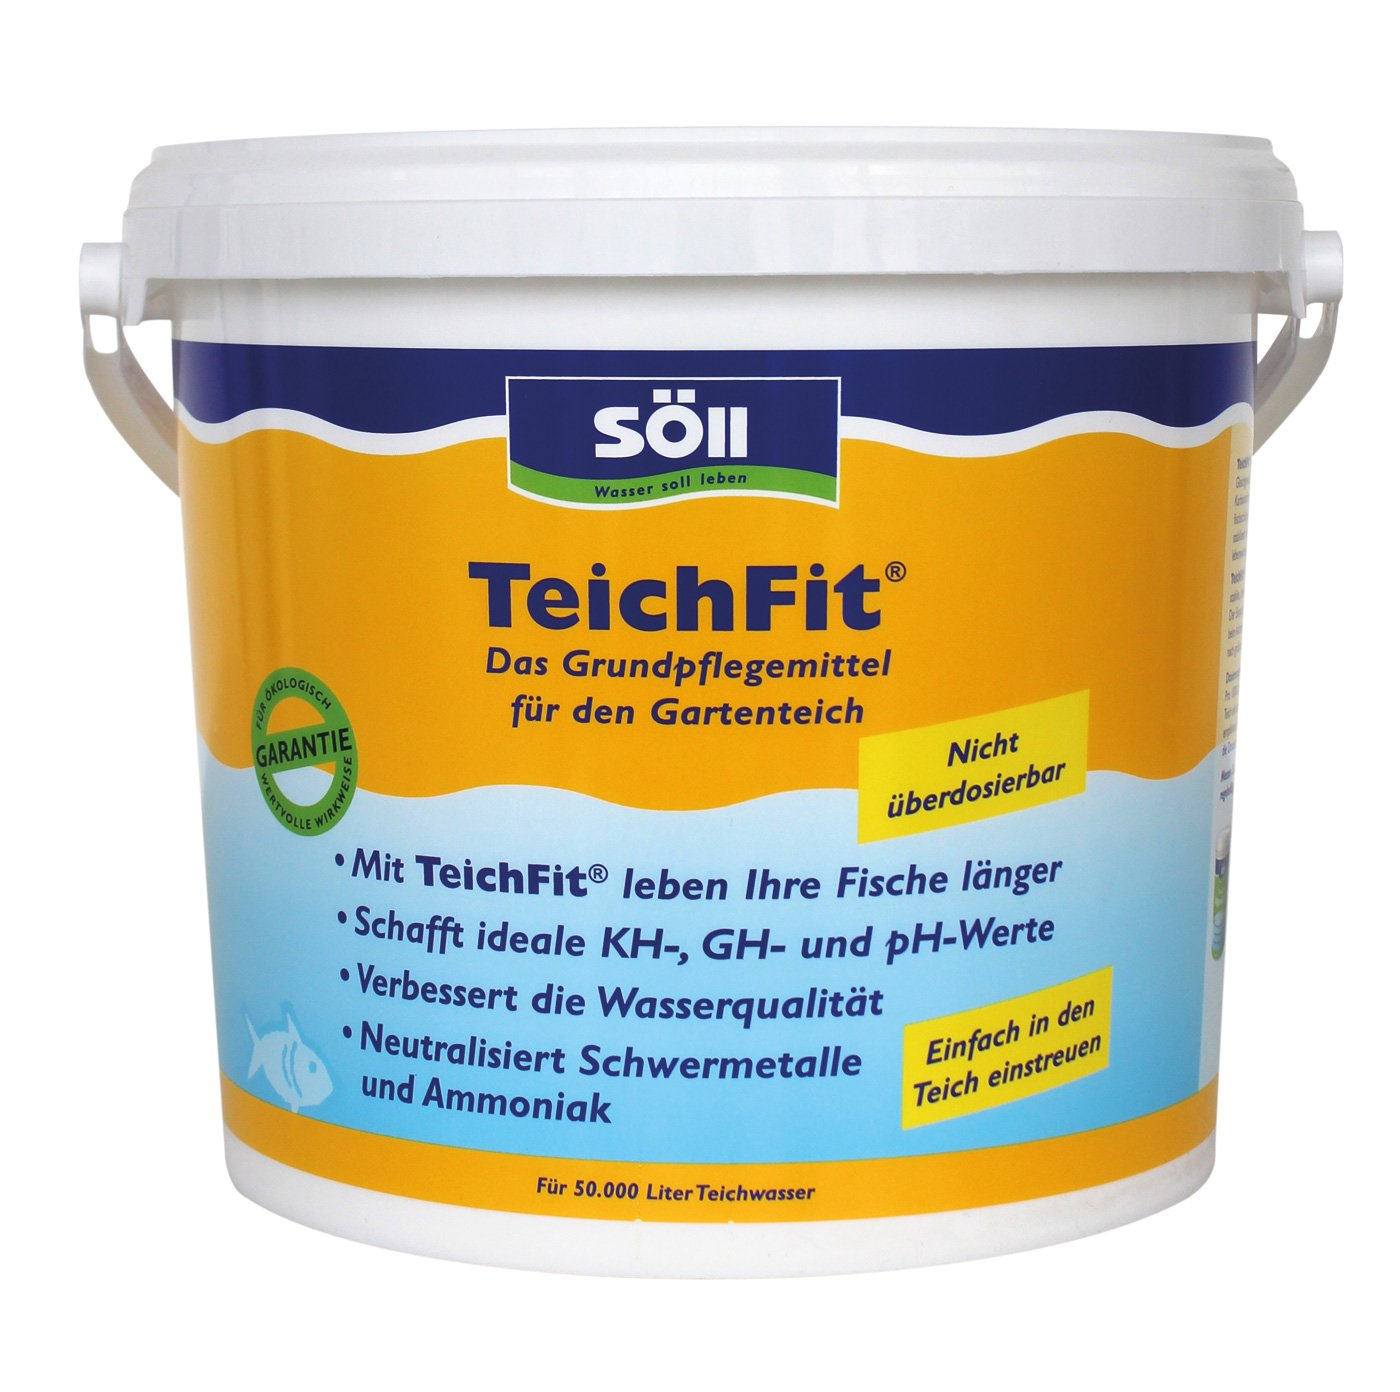 Söll TeichFit 1kg Söll GmbH 15212 B0015FS6PA